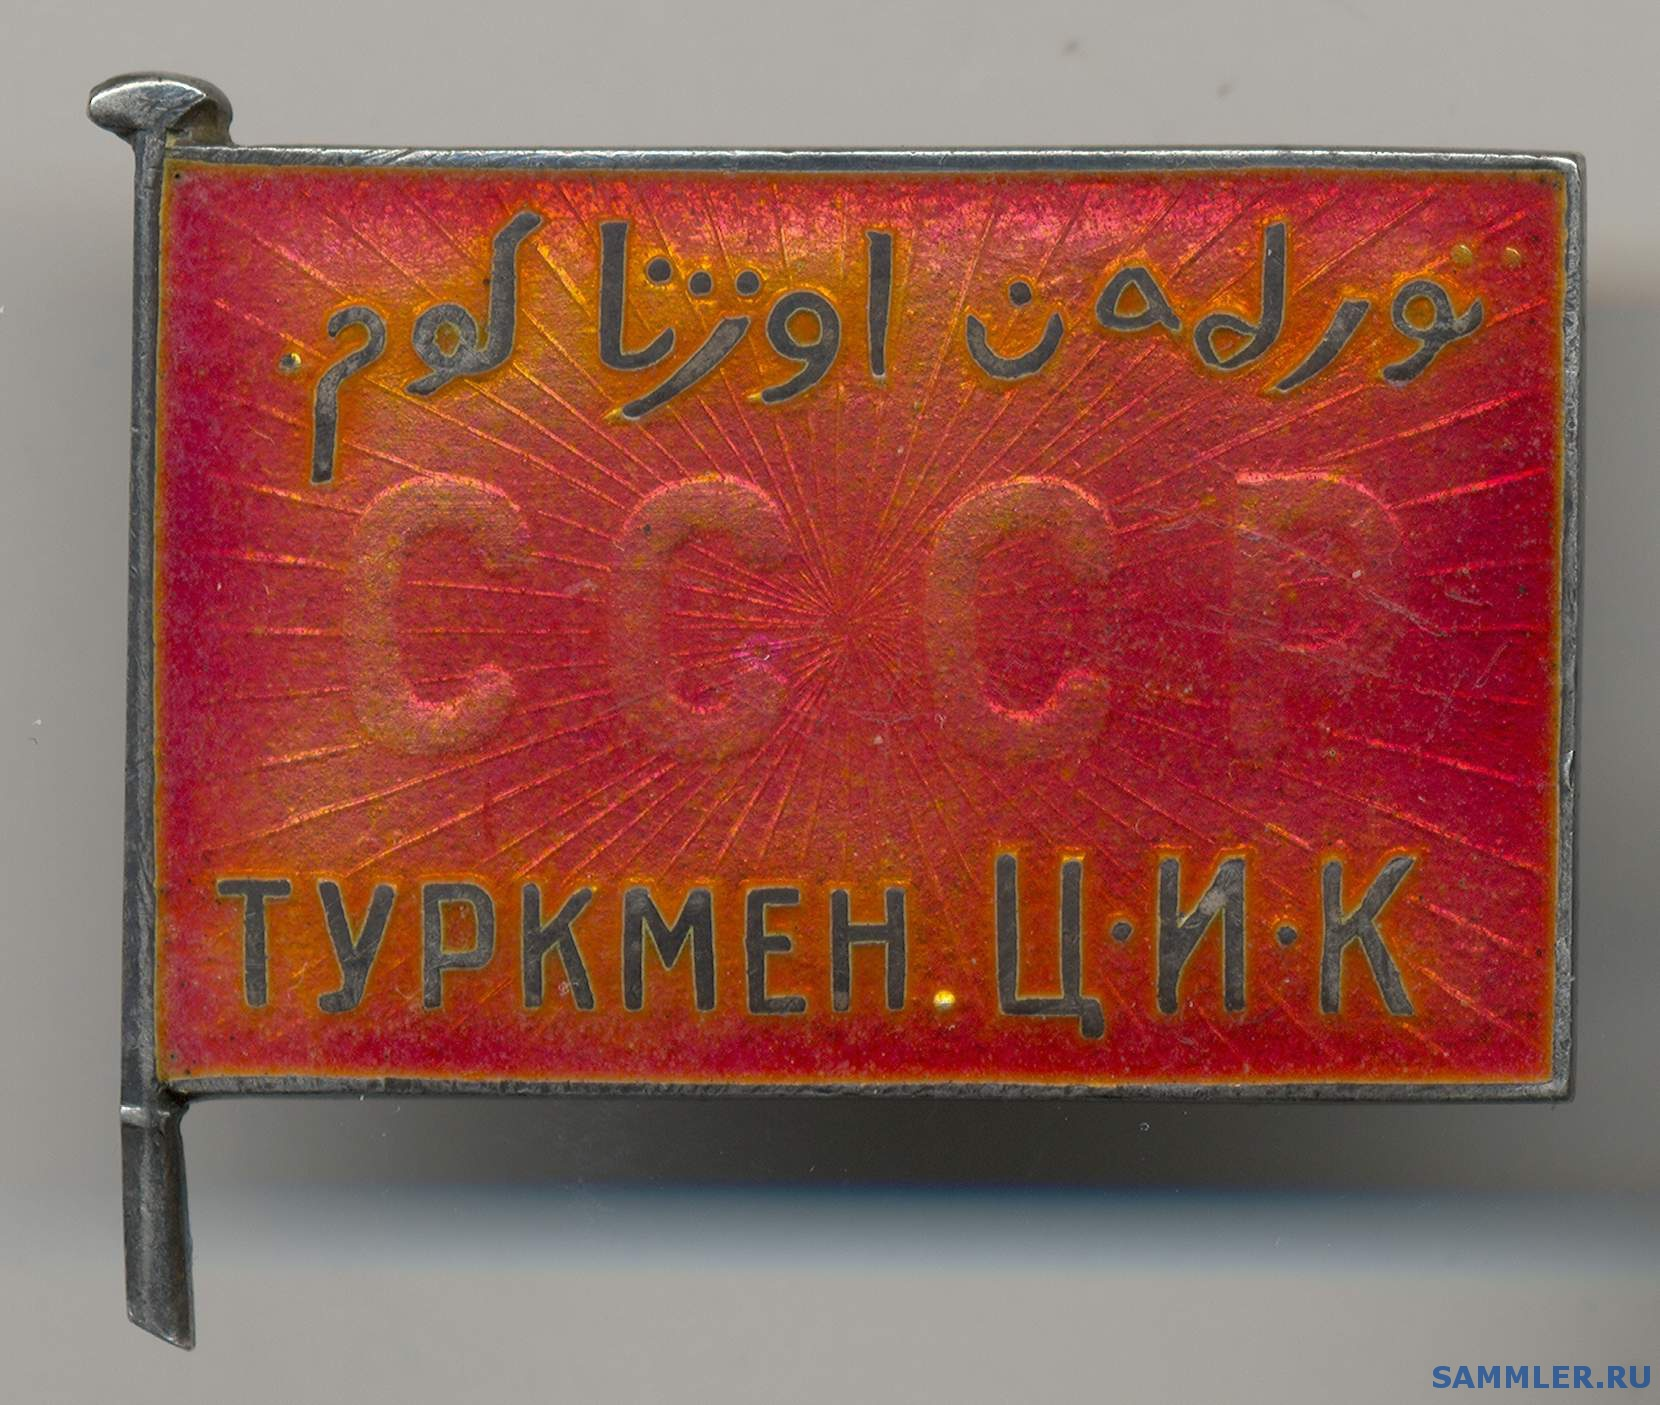 turkmen_CIK_av.jpg